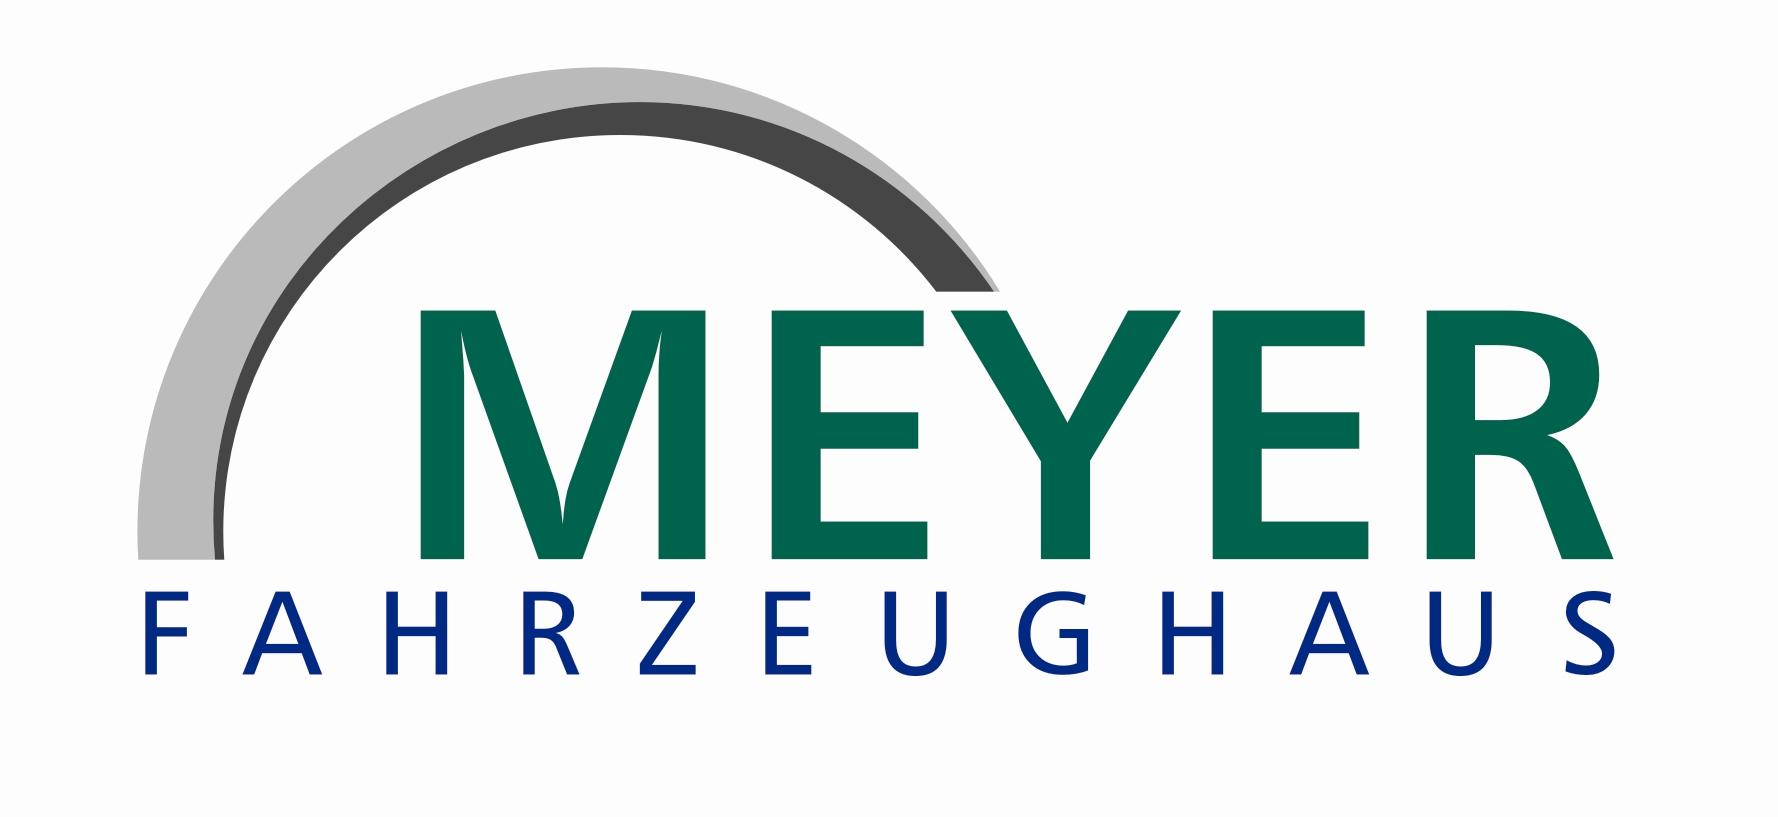 Fahrzeughaus Meyer